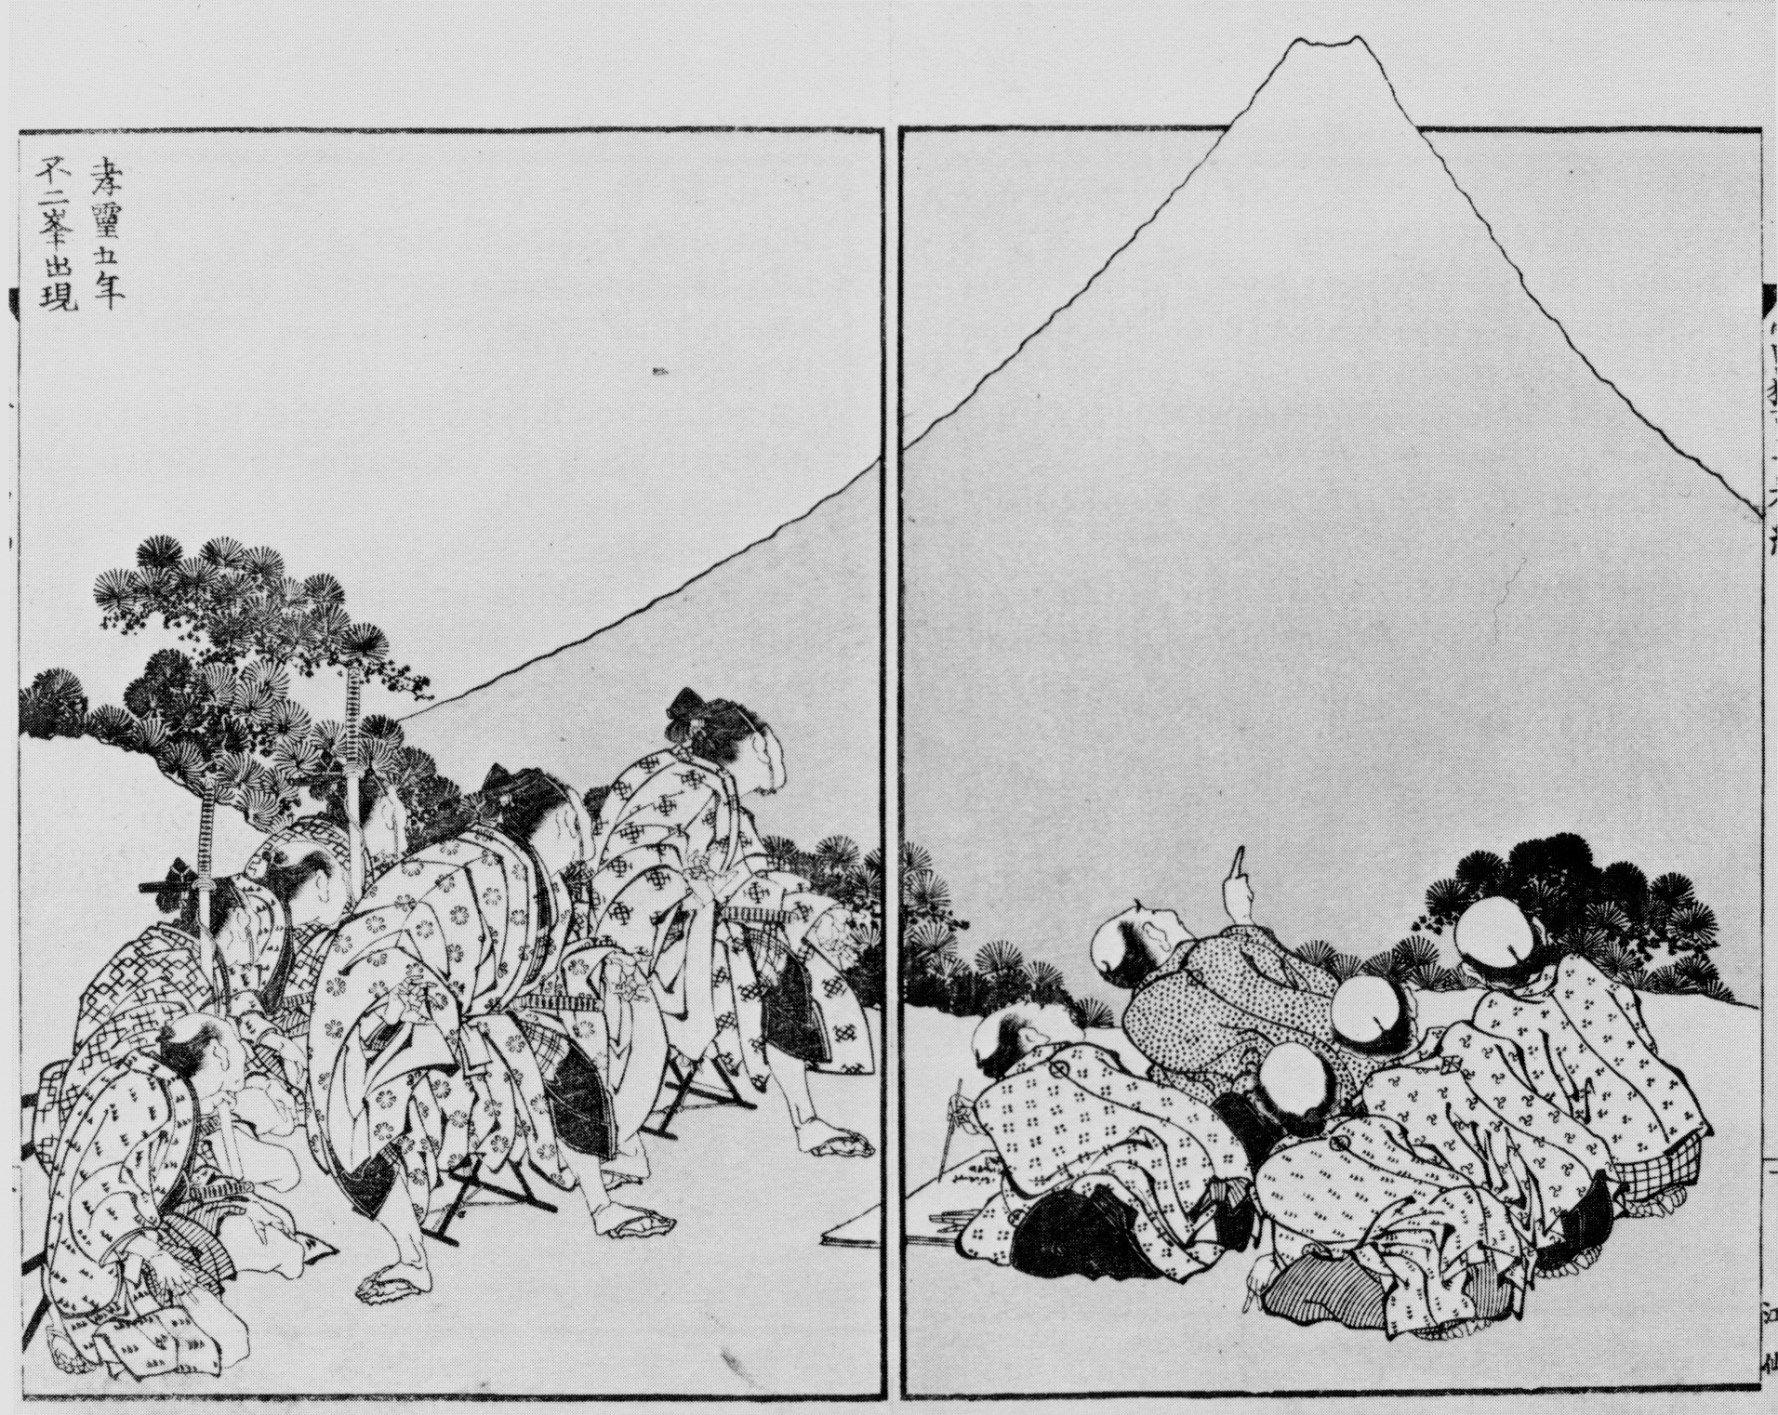 Katsushika Hokusai - Fuji appearing